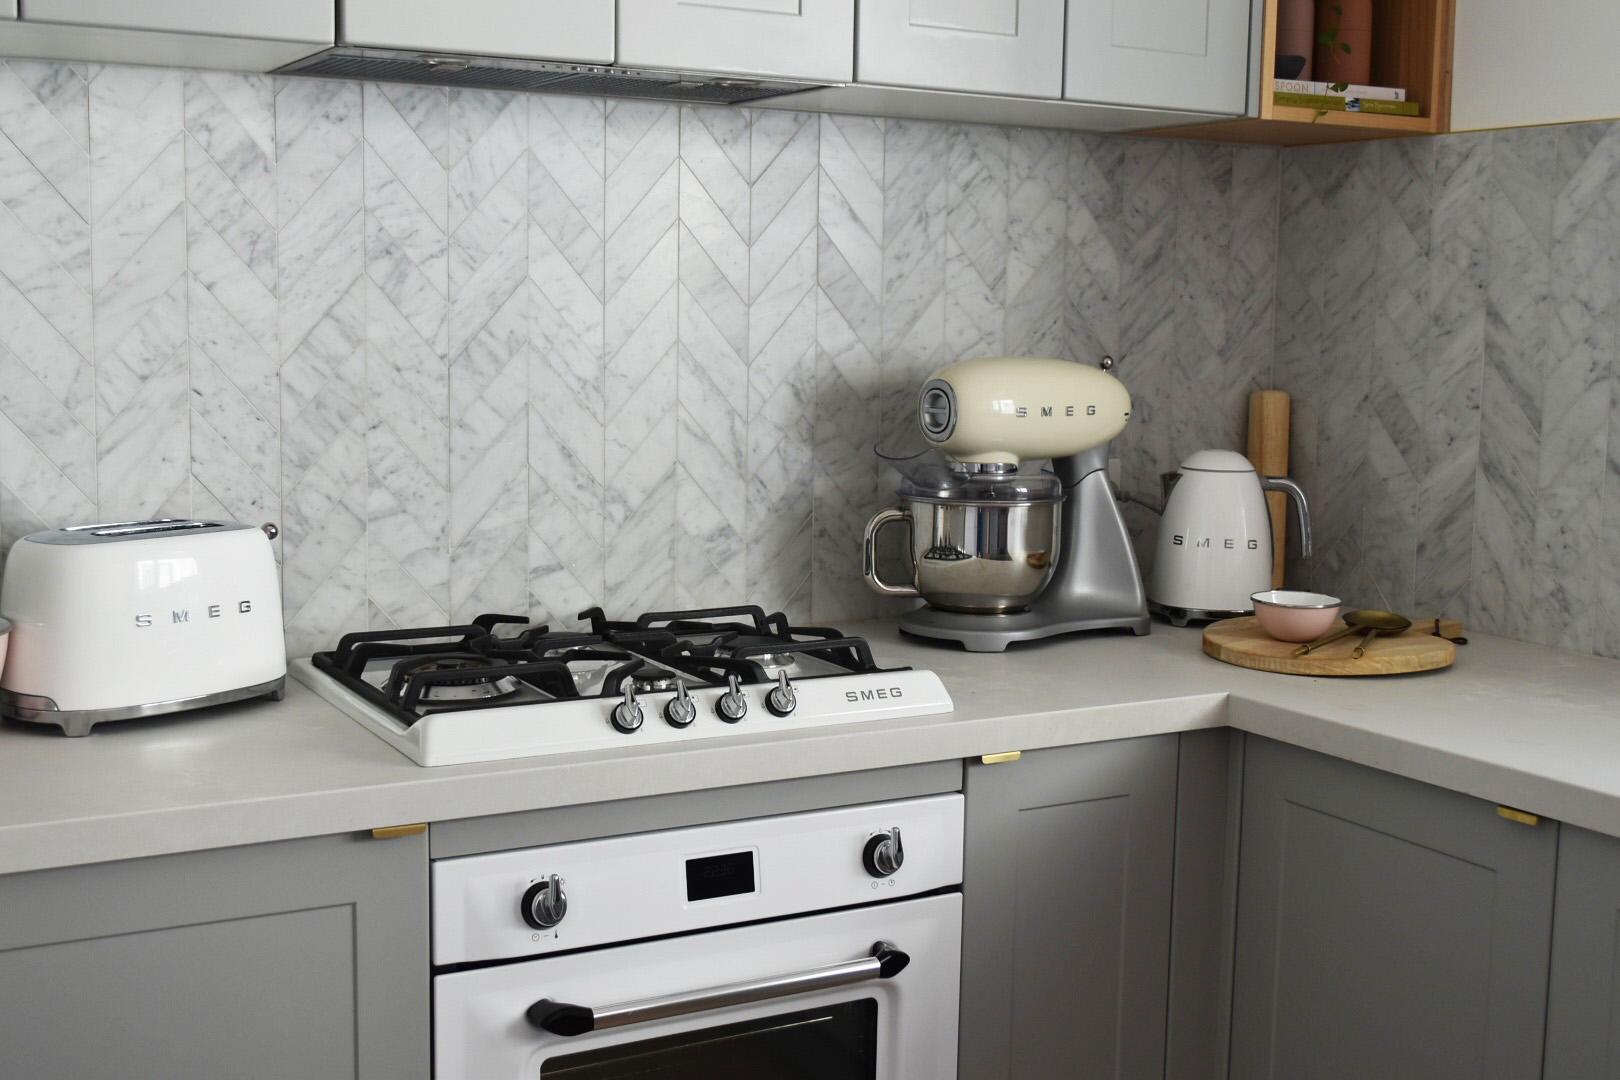 Carrara marble splash back tiles